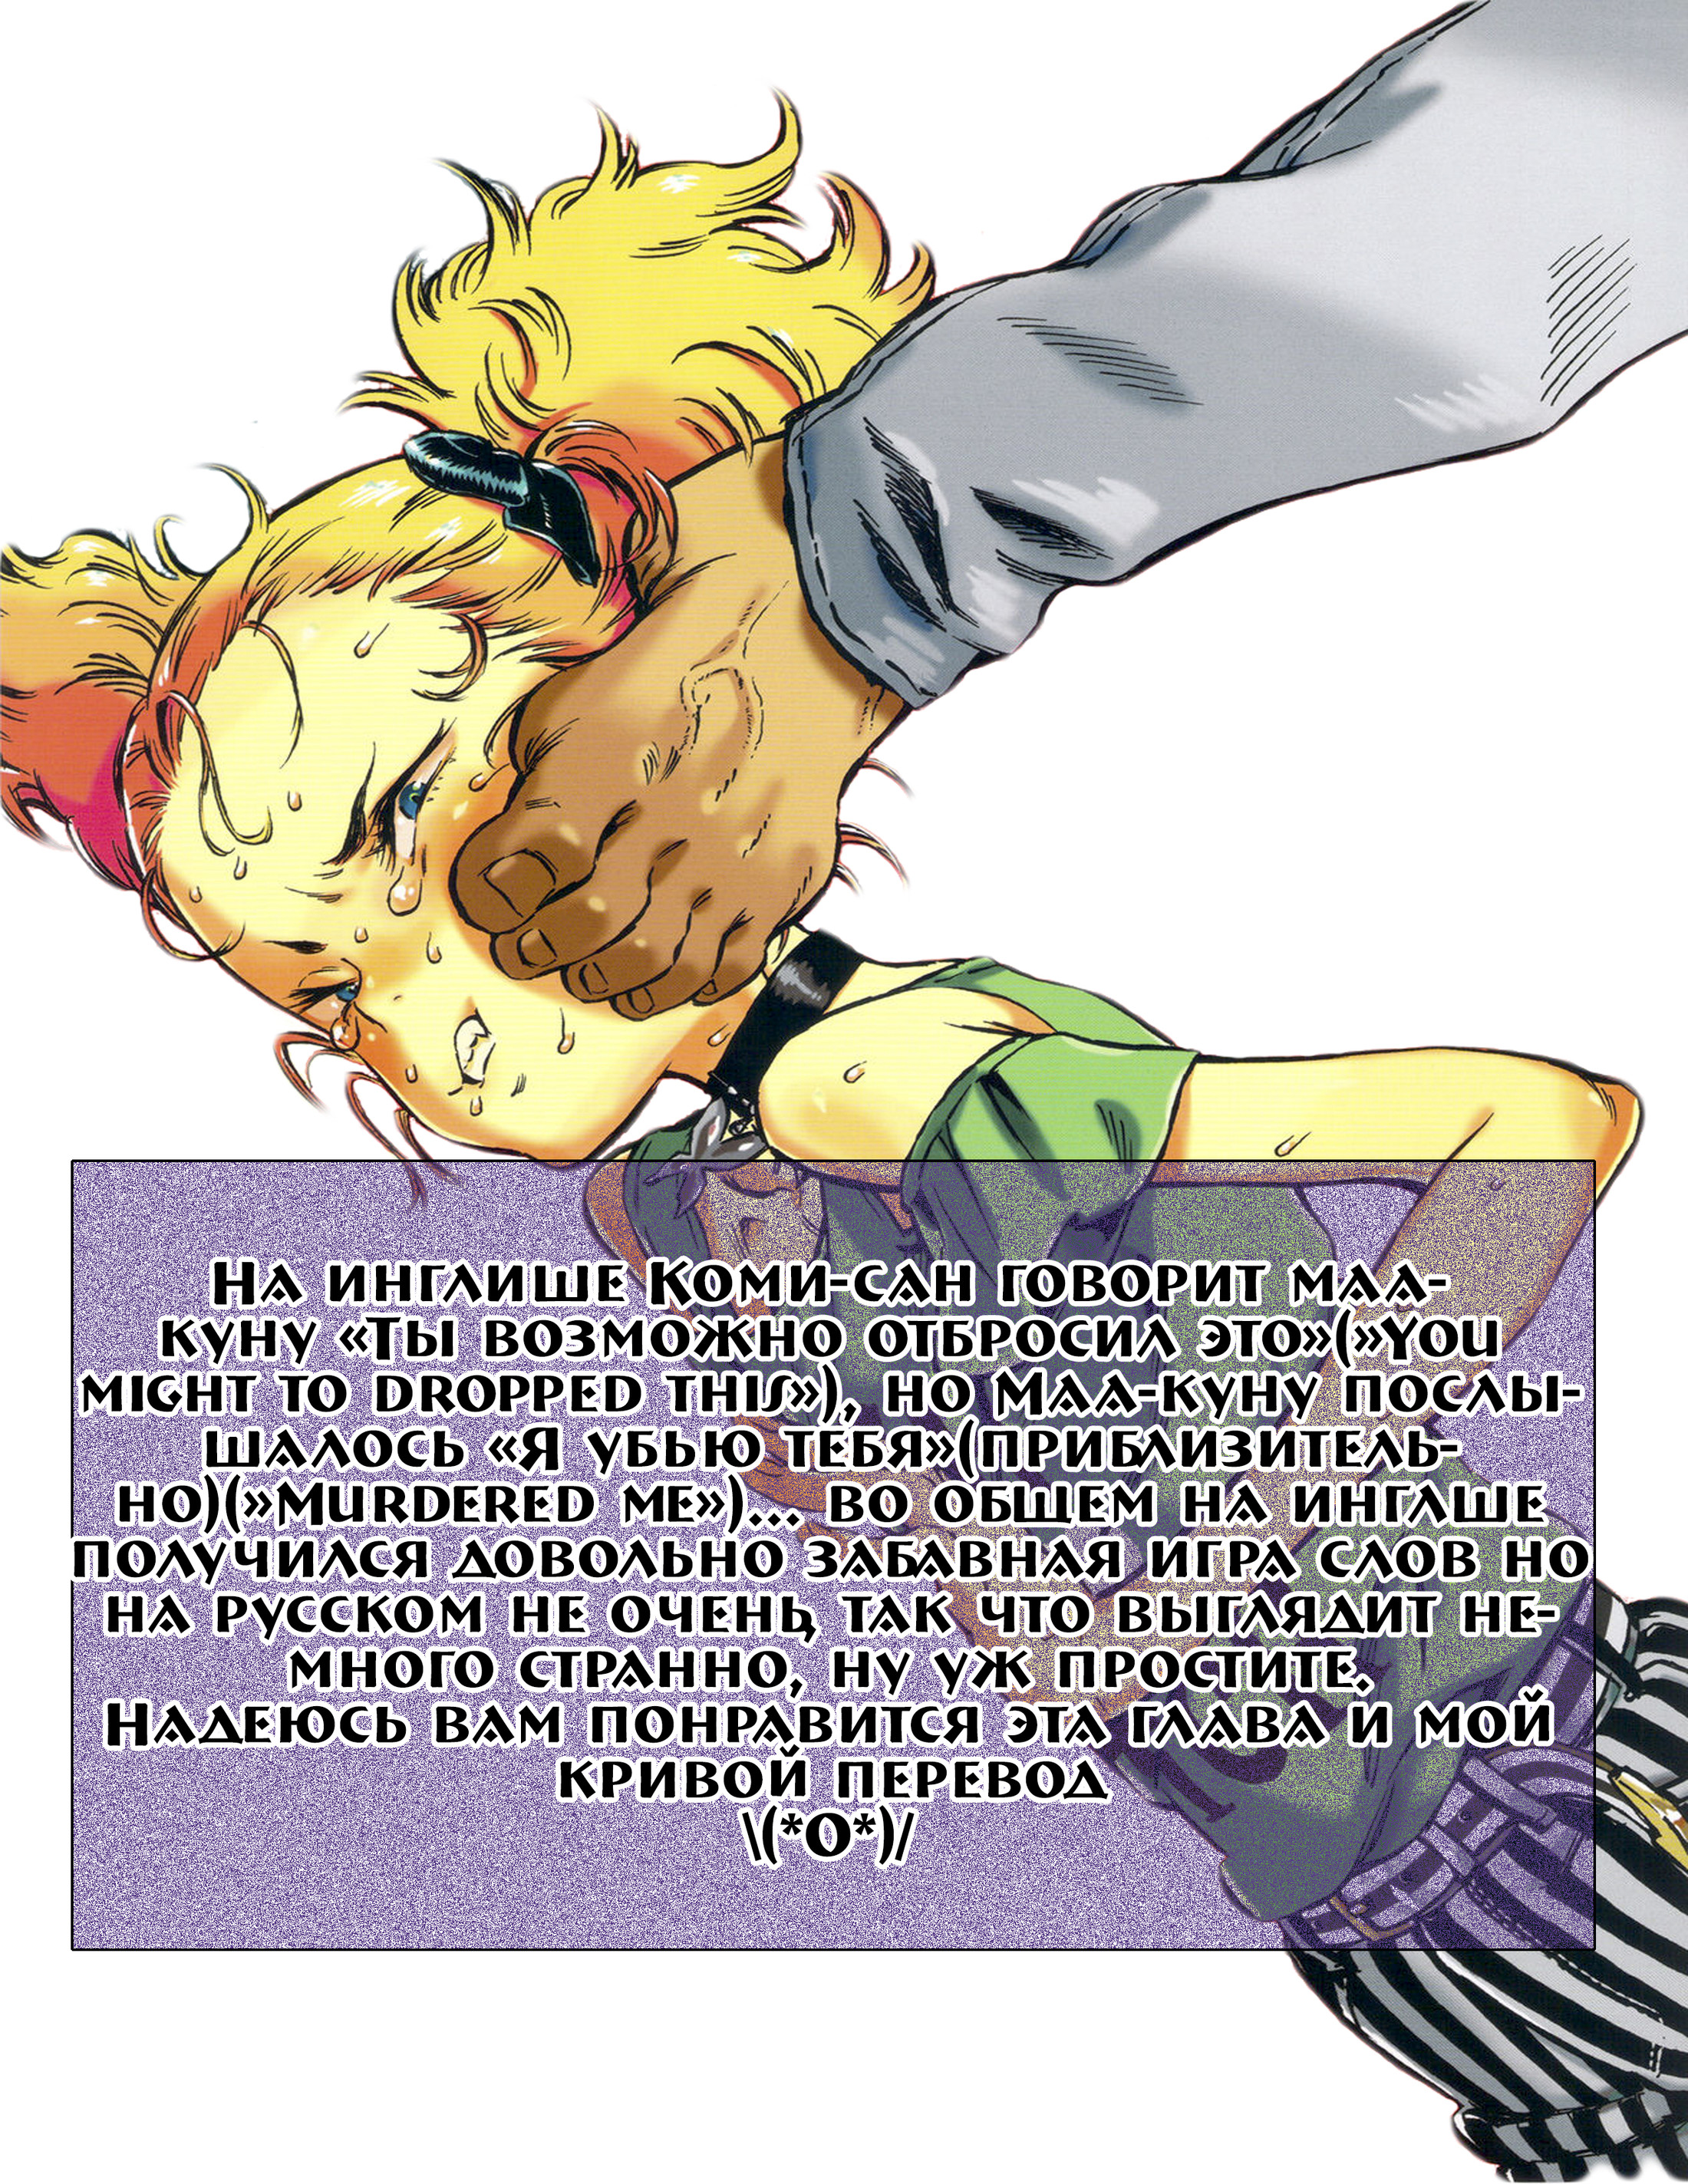 https://r1.ninemanga.com/comics/pic2/12/27788/330160/1500984530322.jpg Page 16